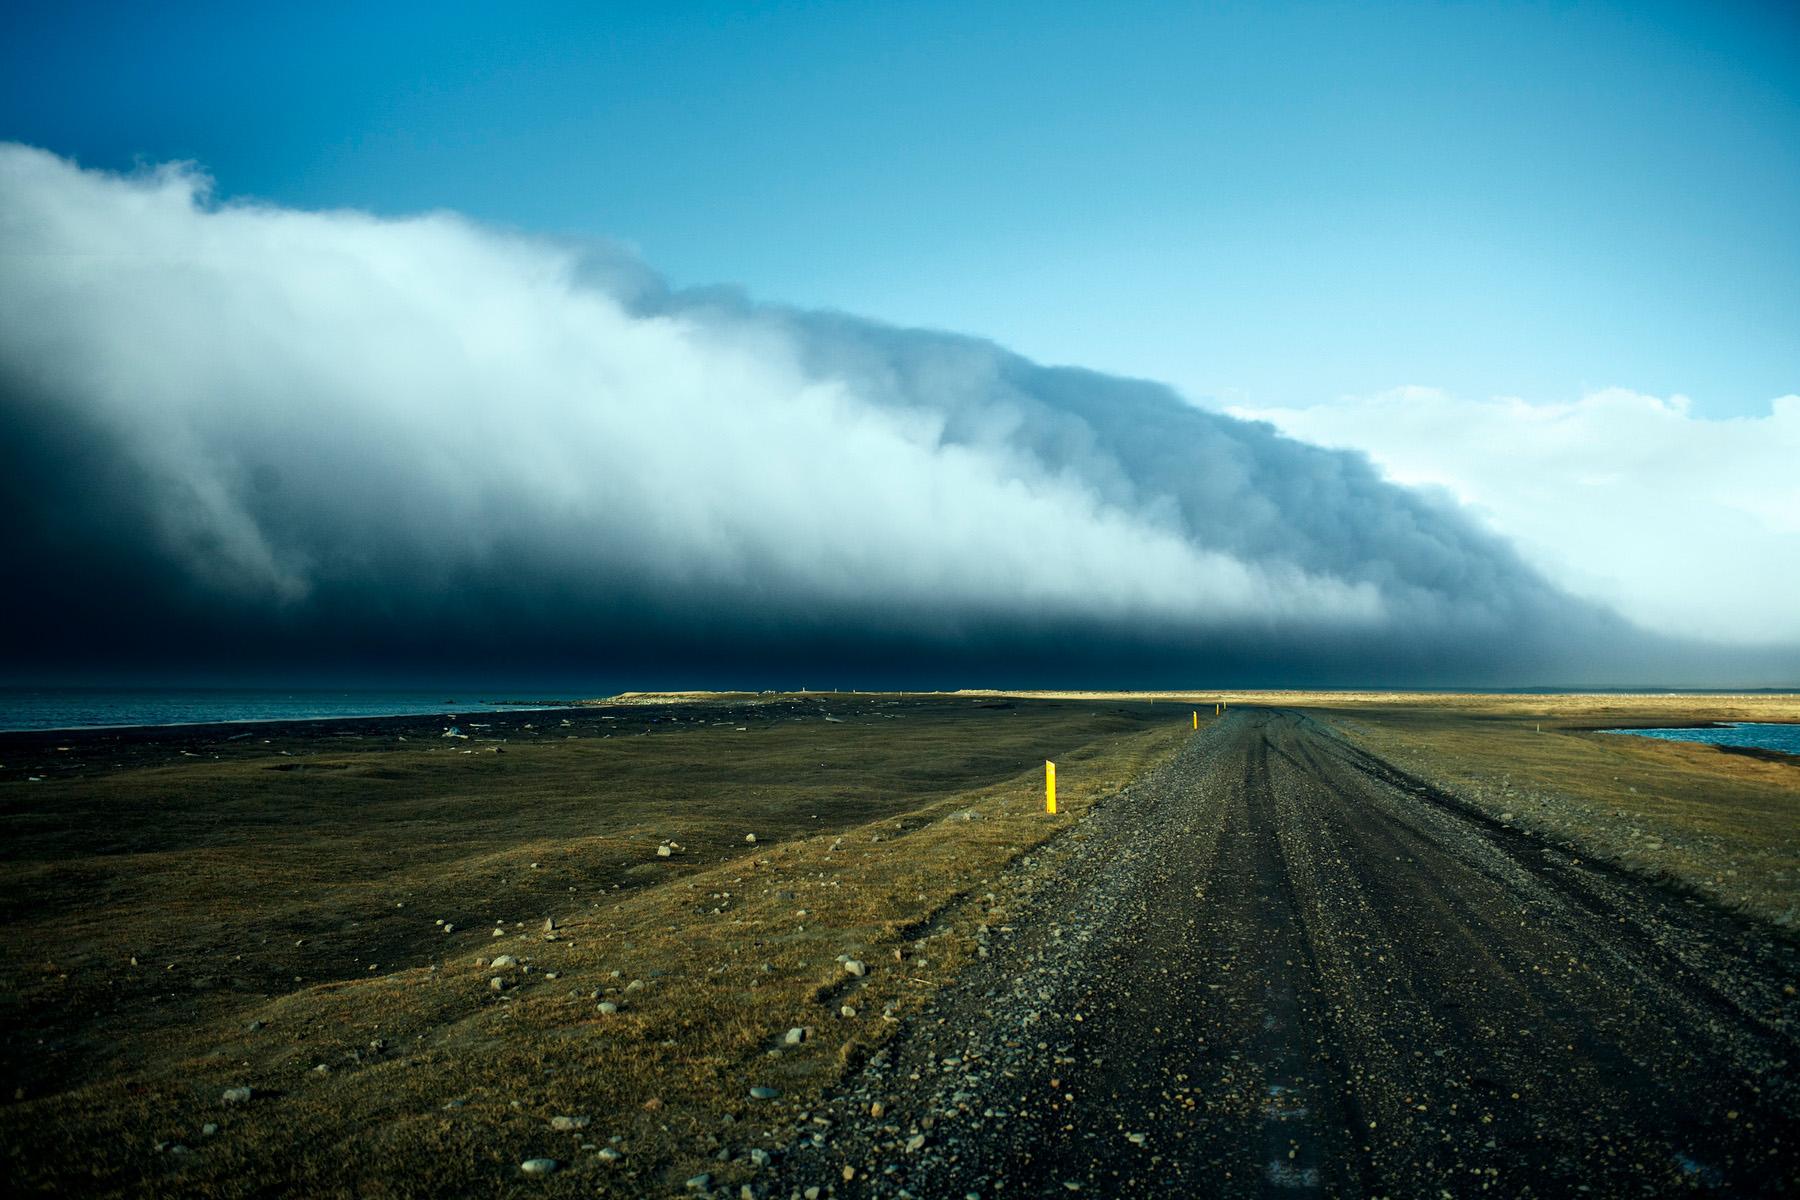 218807-11227738-Iceland_Day06-02-001984_jpg.jpg